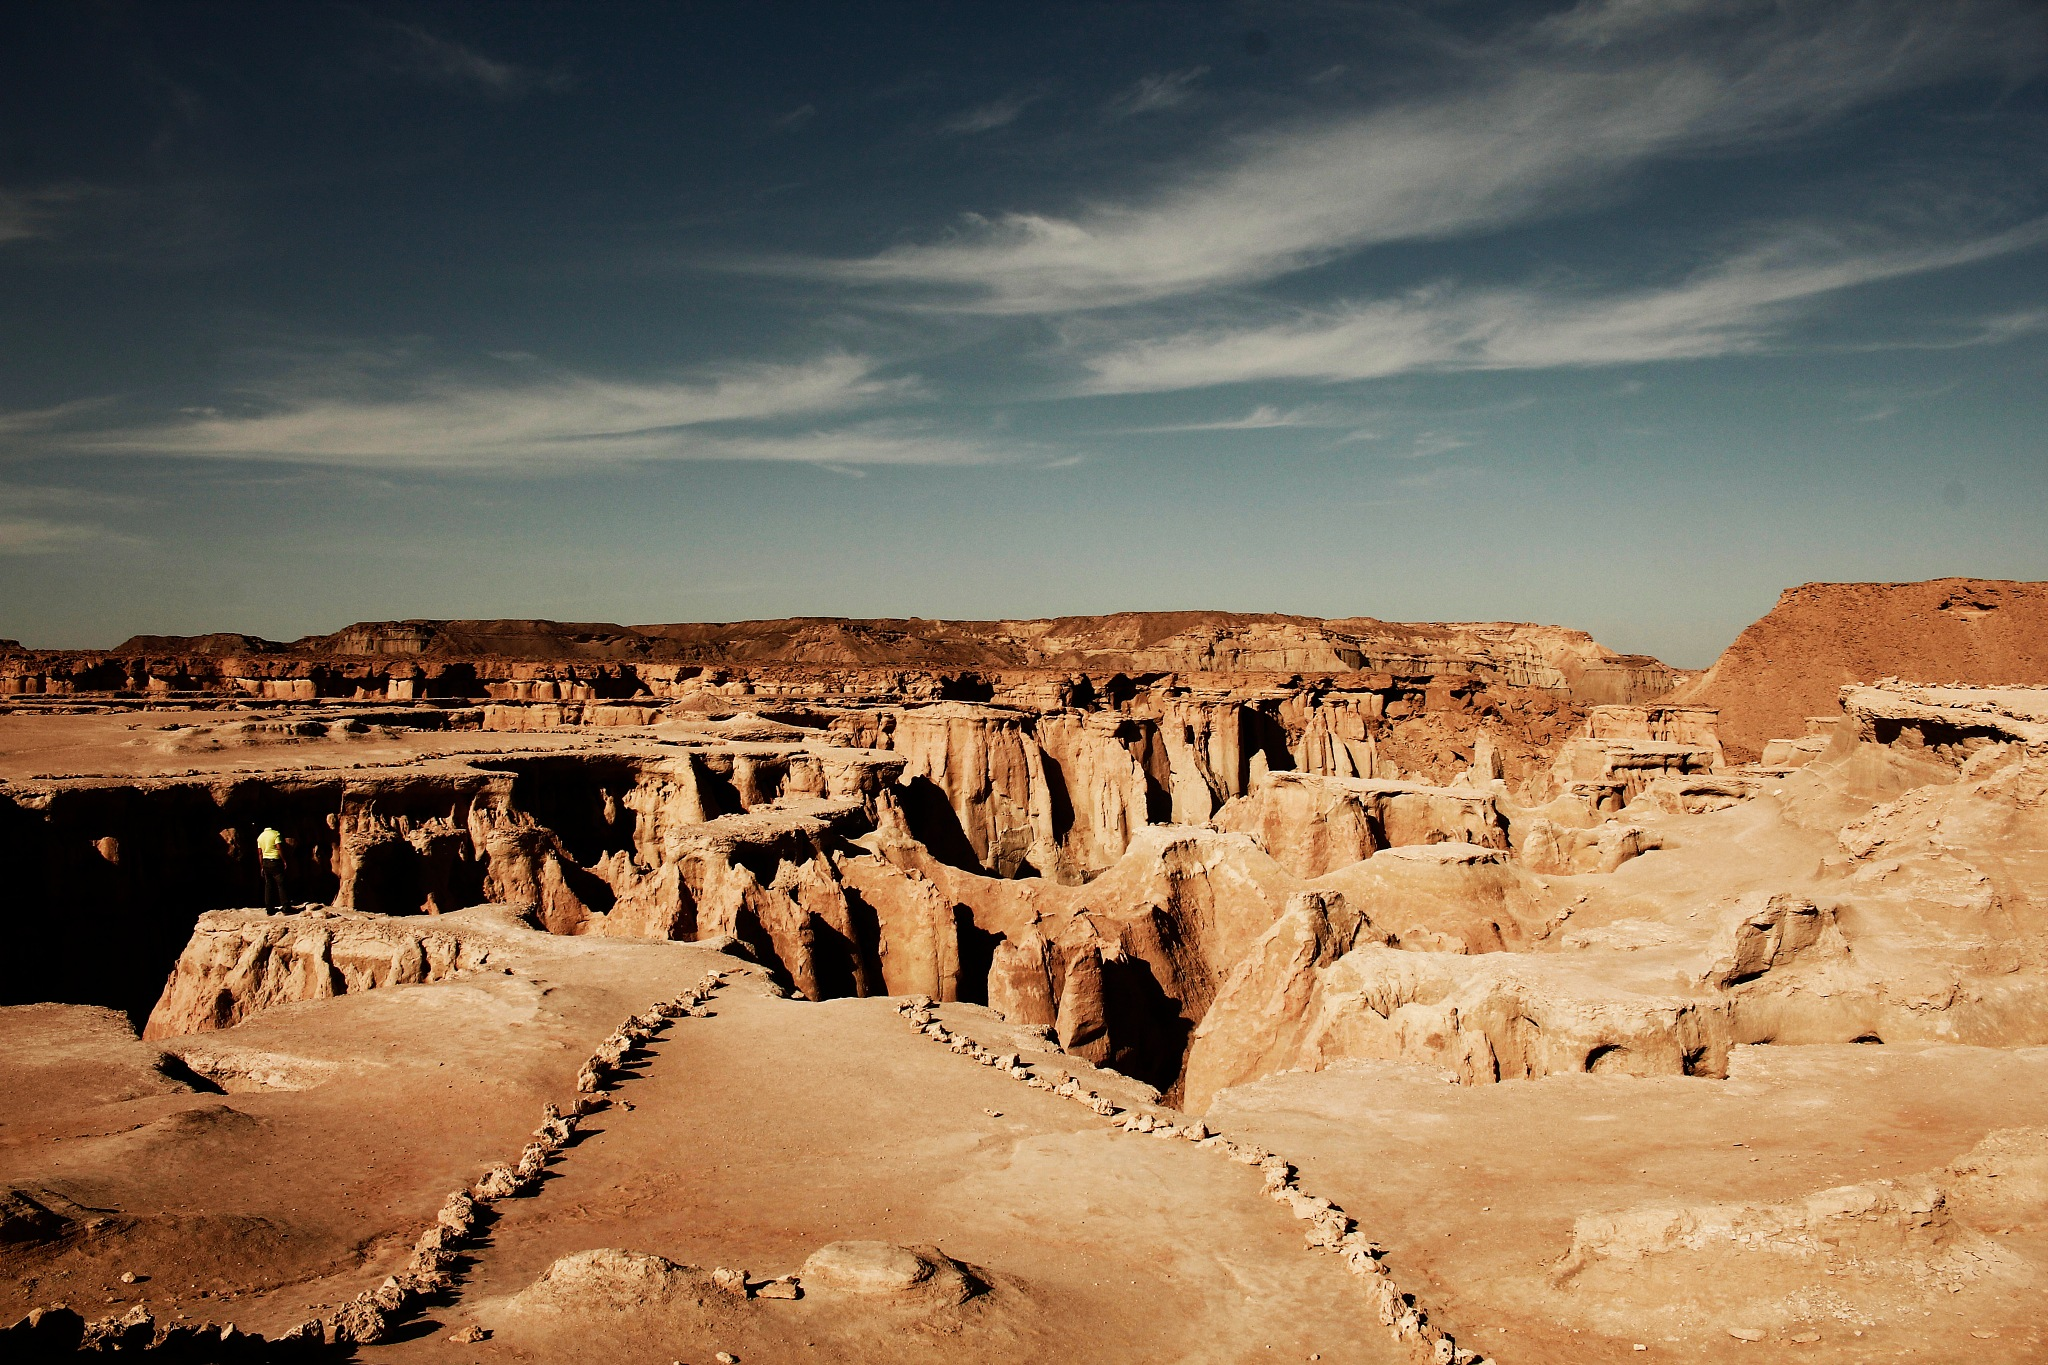 Silence in Desert by Mohammad Hashemi